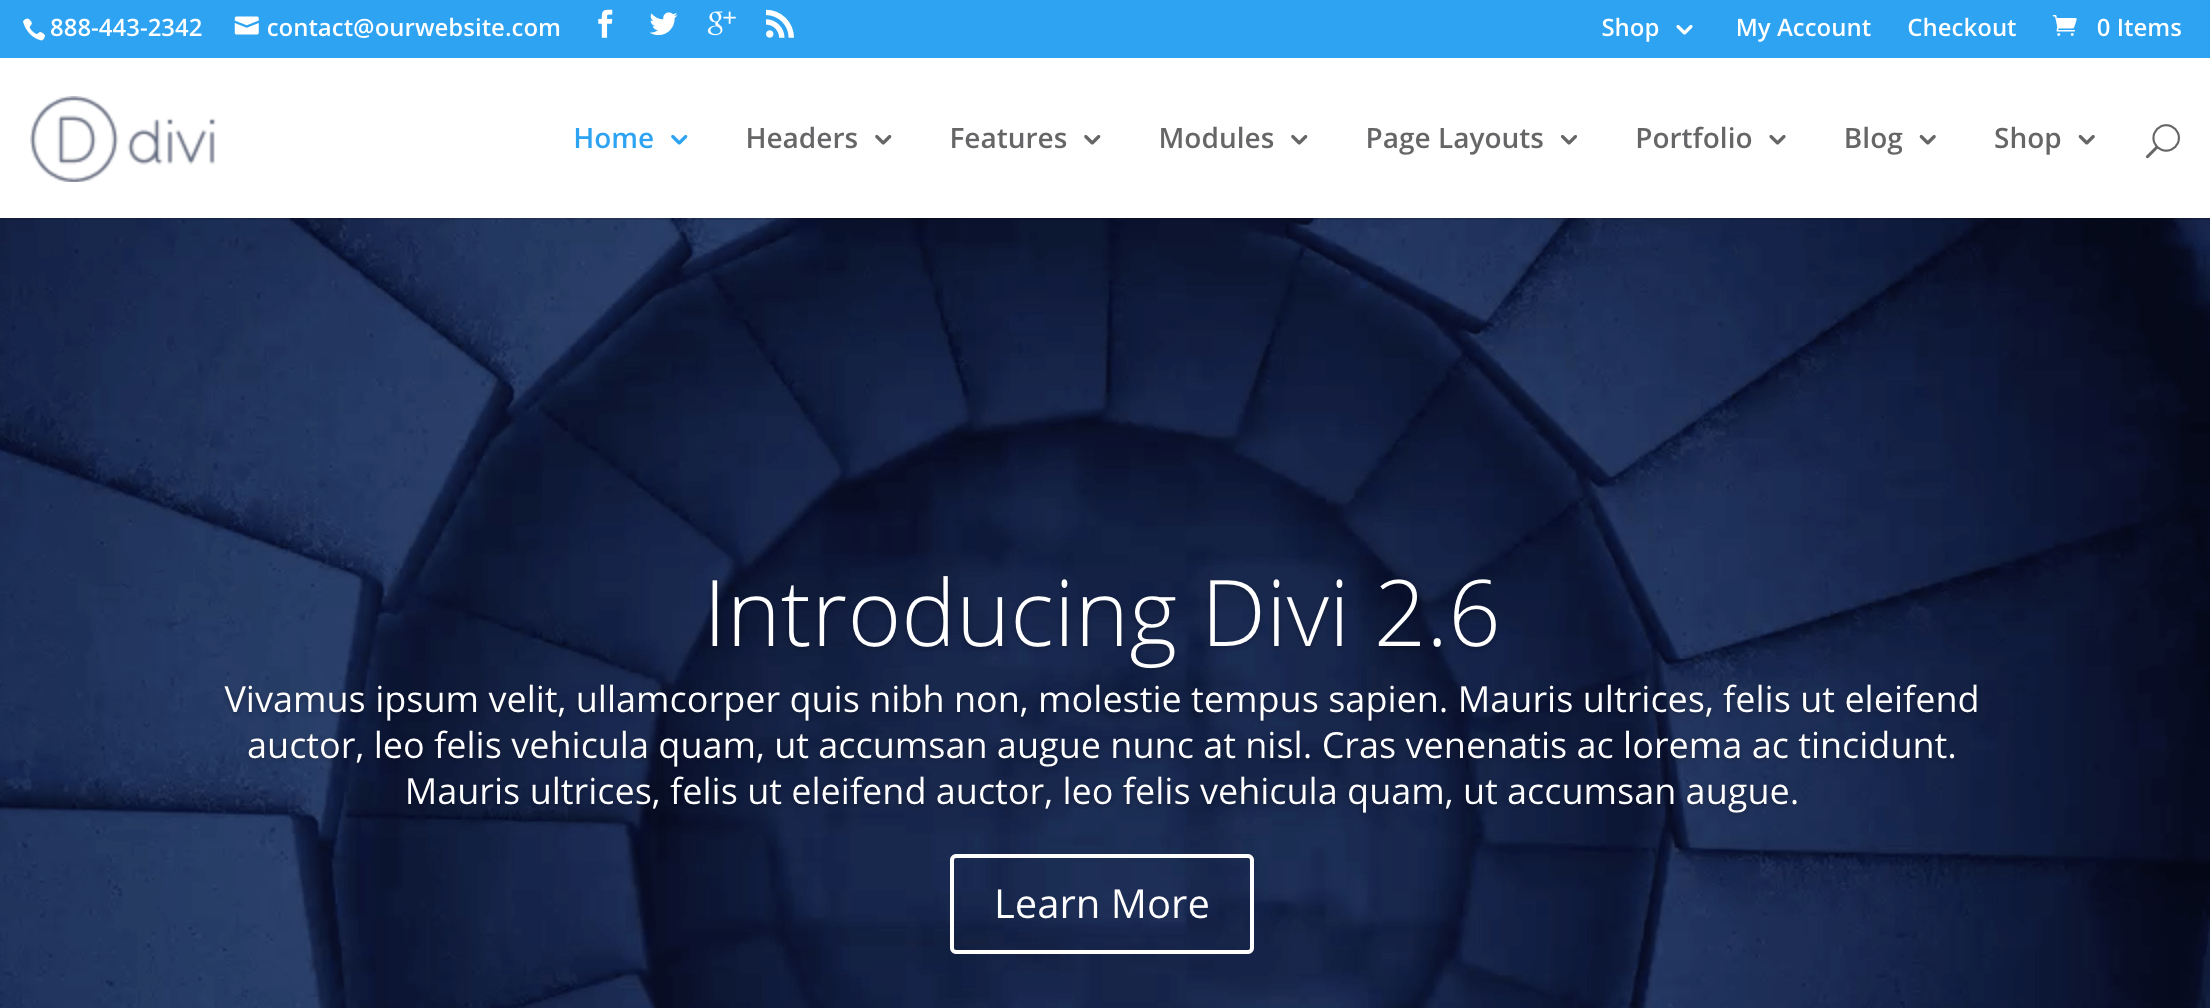 A screenshot of the Divi theme.